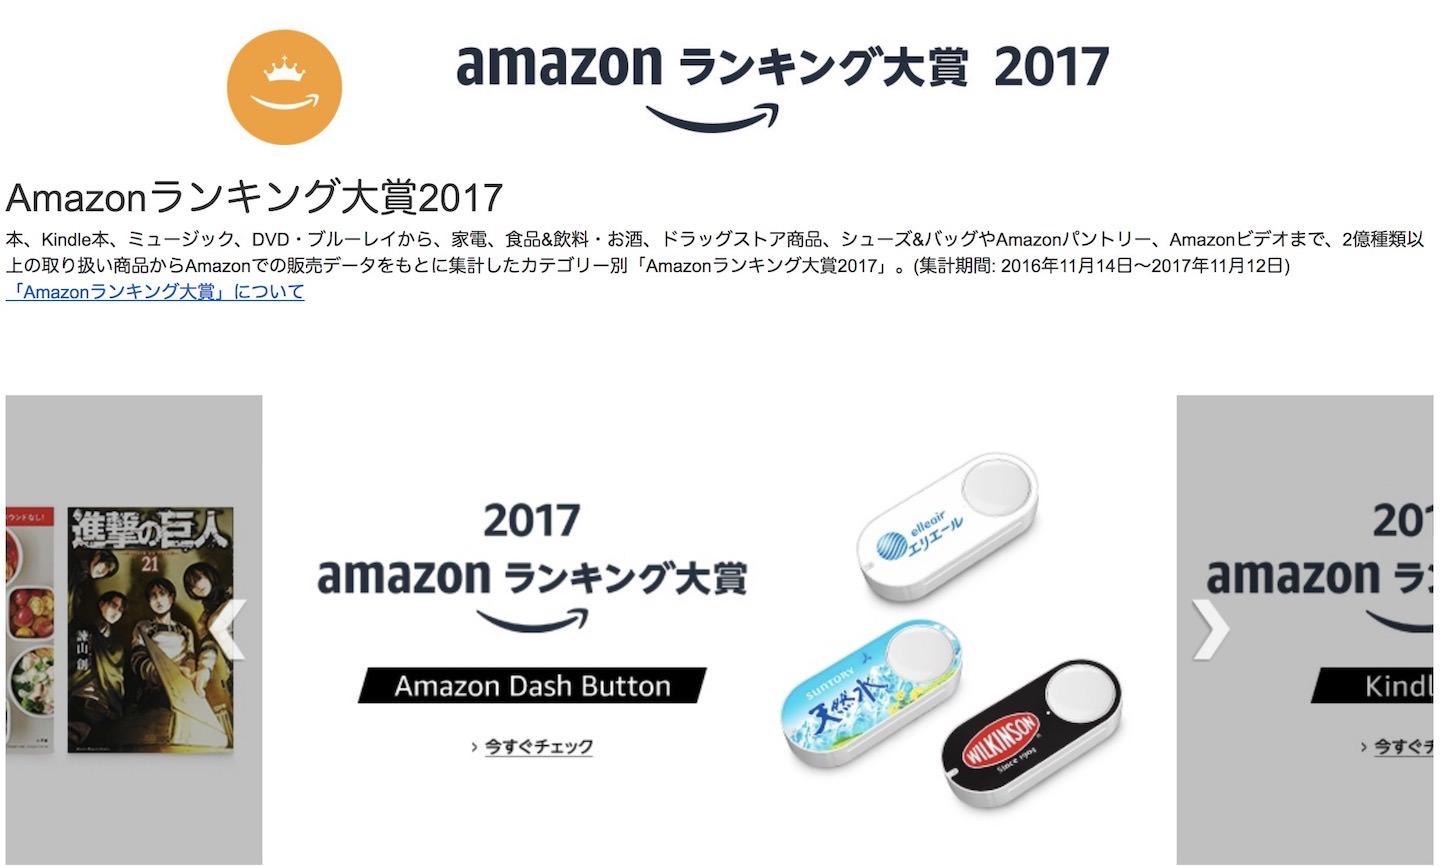 Amazon-Ranking-2017-2